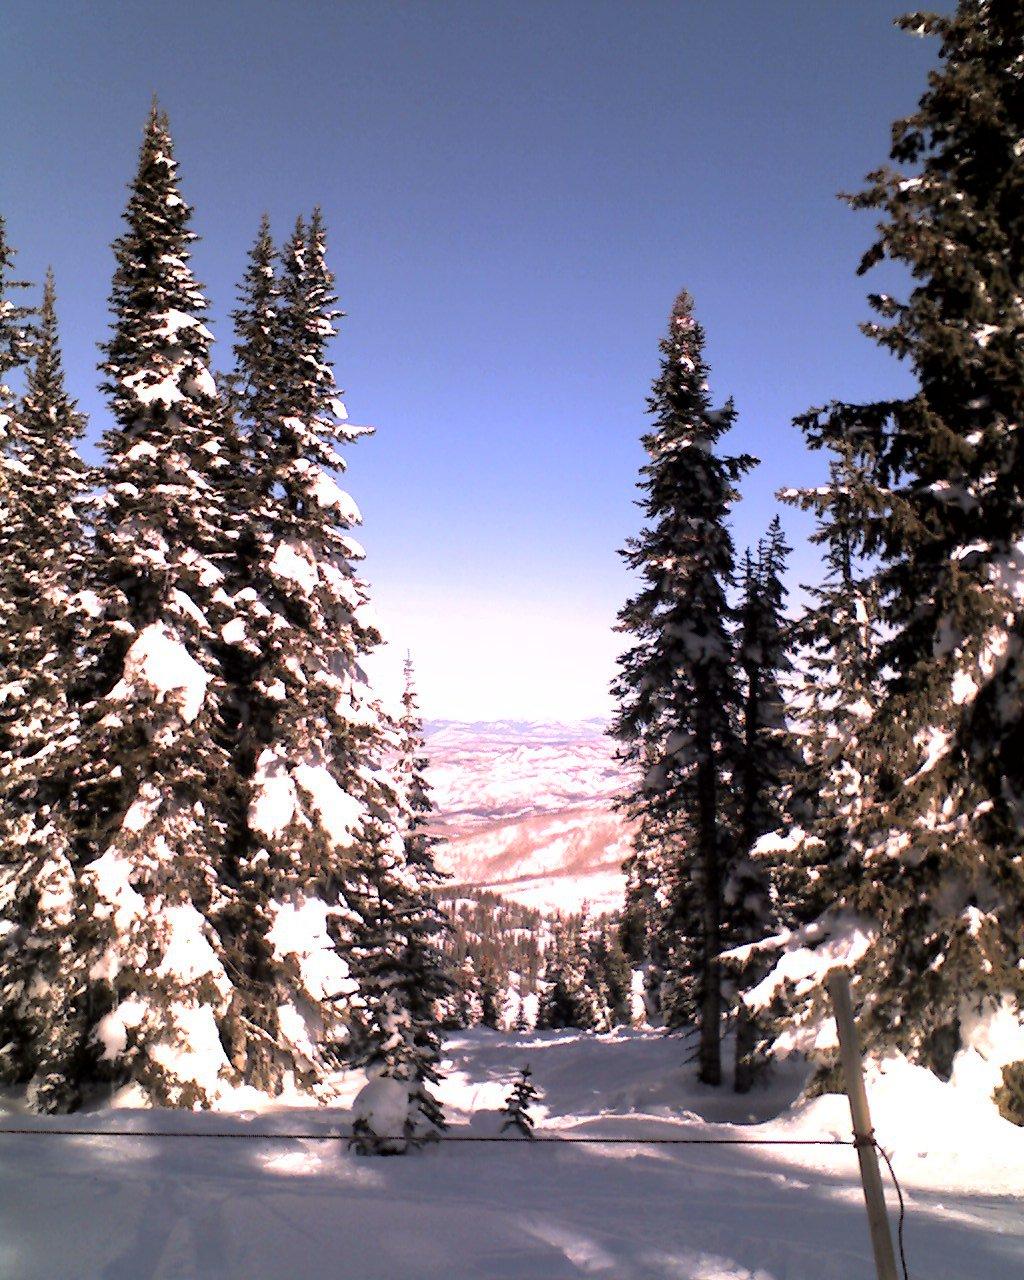 Skiing - 1 of 18